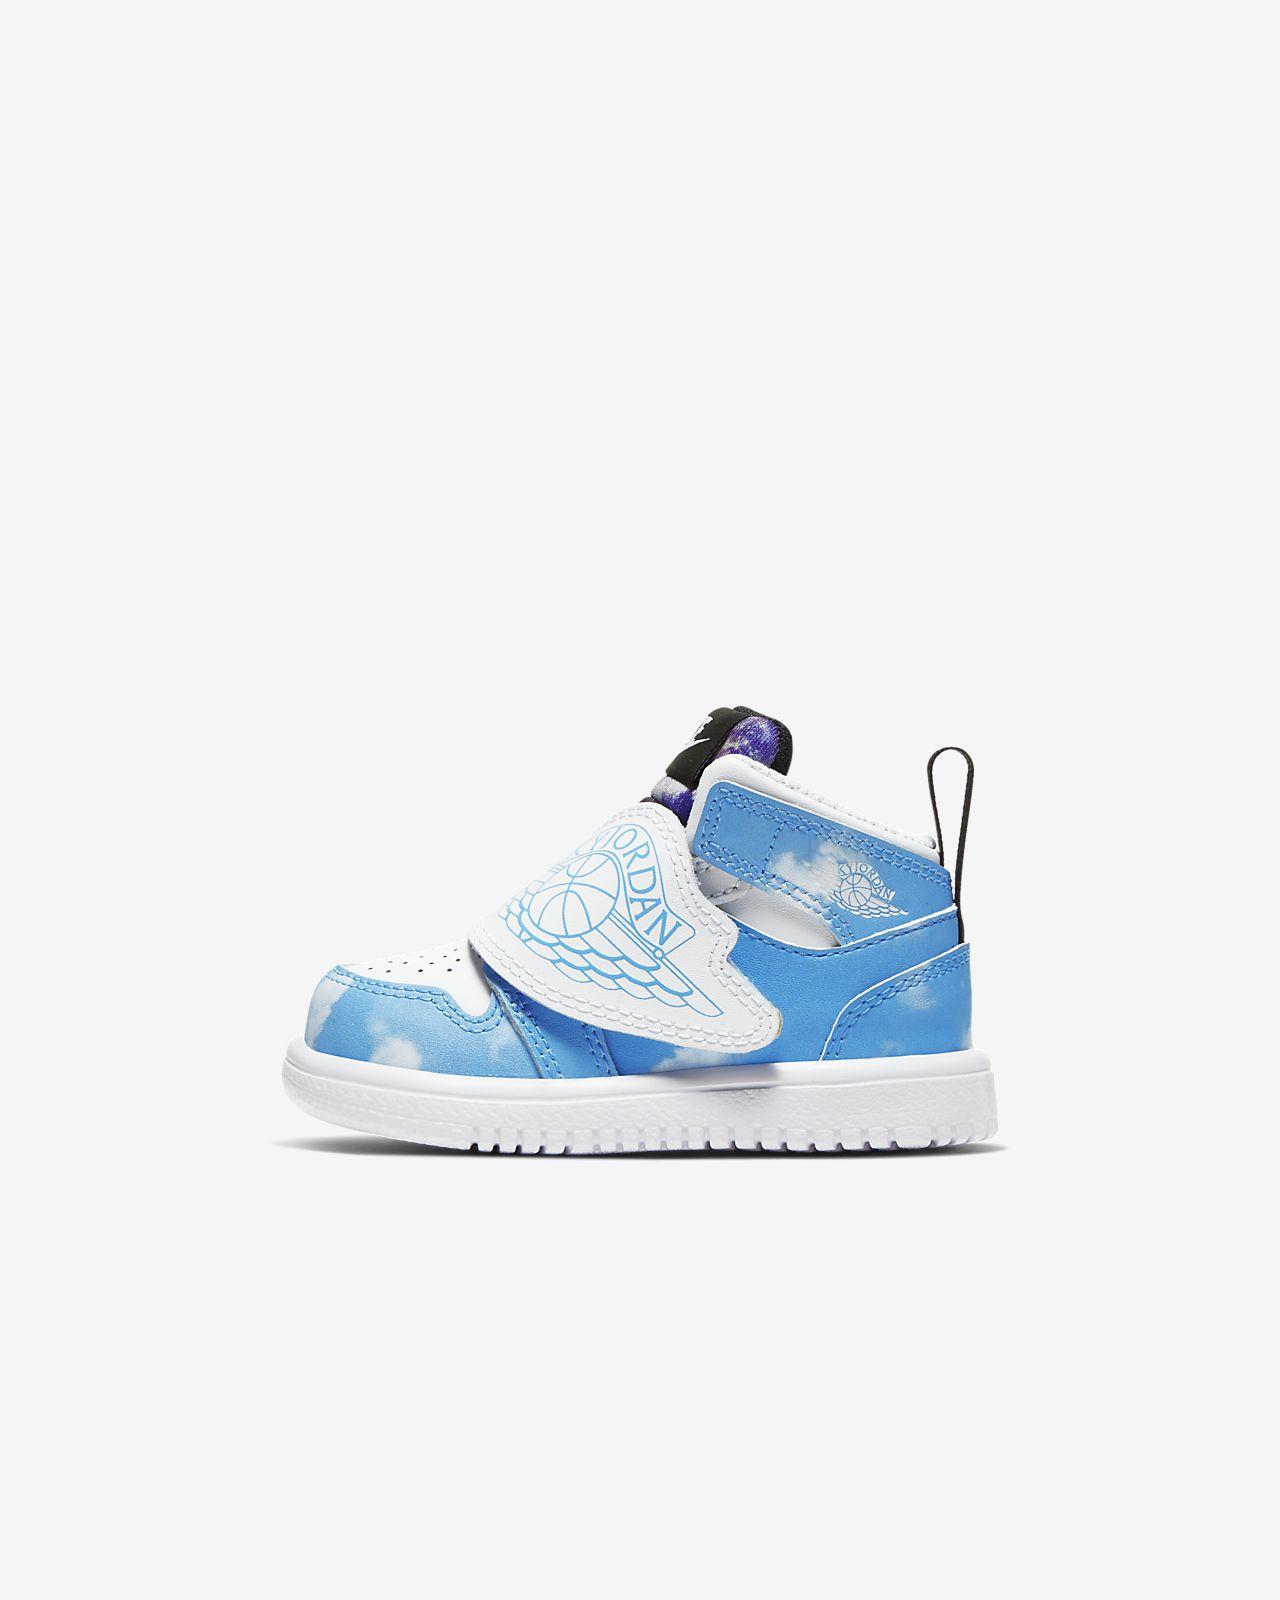 Sky Jordan 1 Fearless Baby and Toddler Shoe